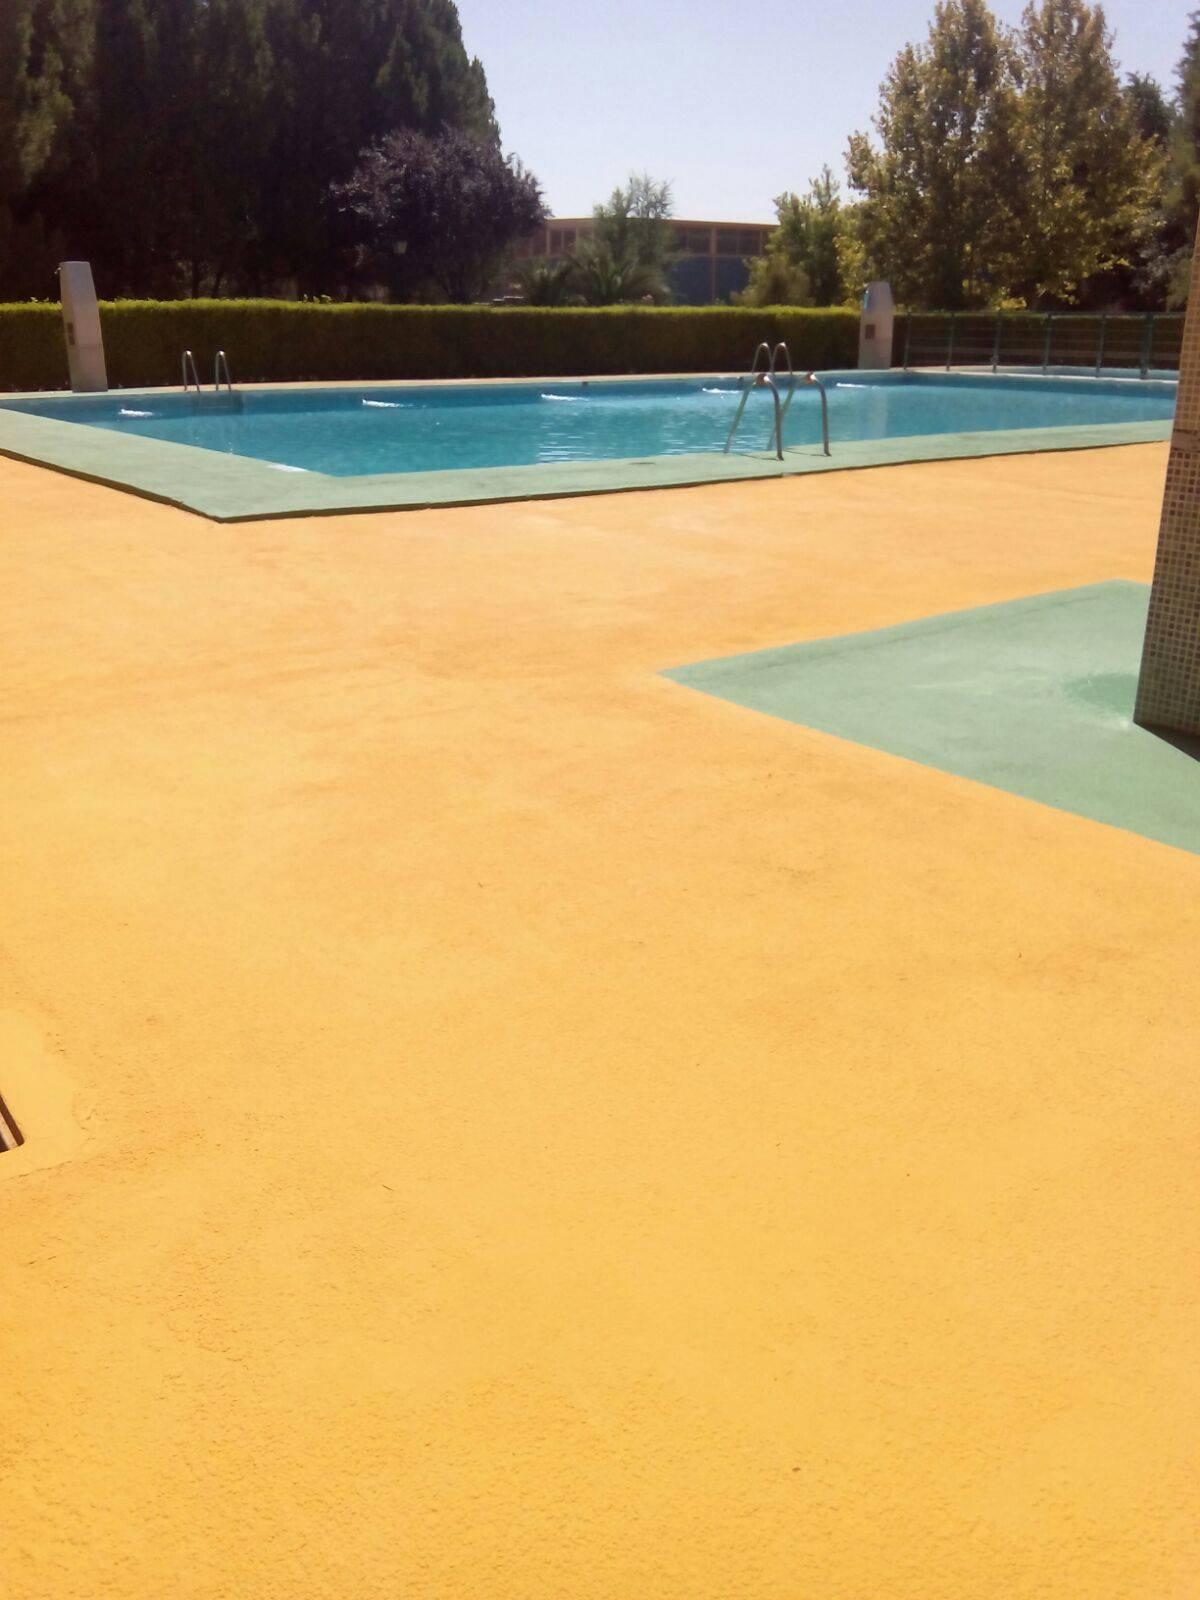 La piscina municipal cerrada por mantenimiento en pleno verano for Piscina municipal